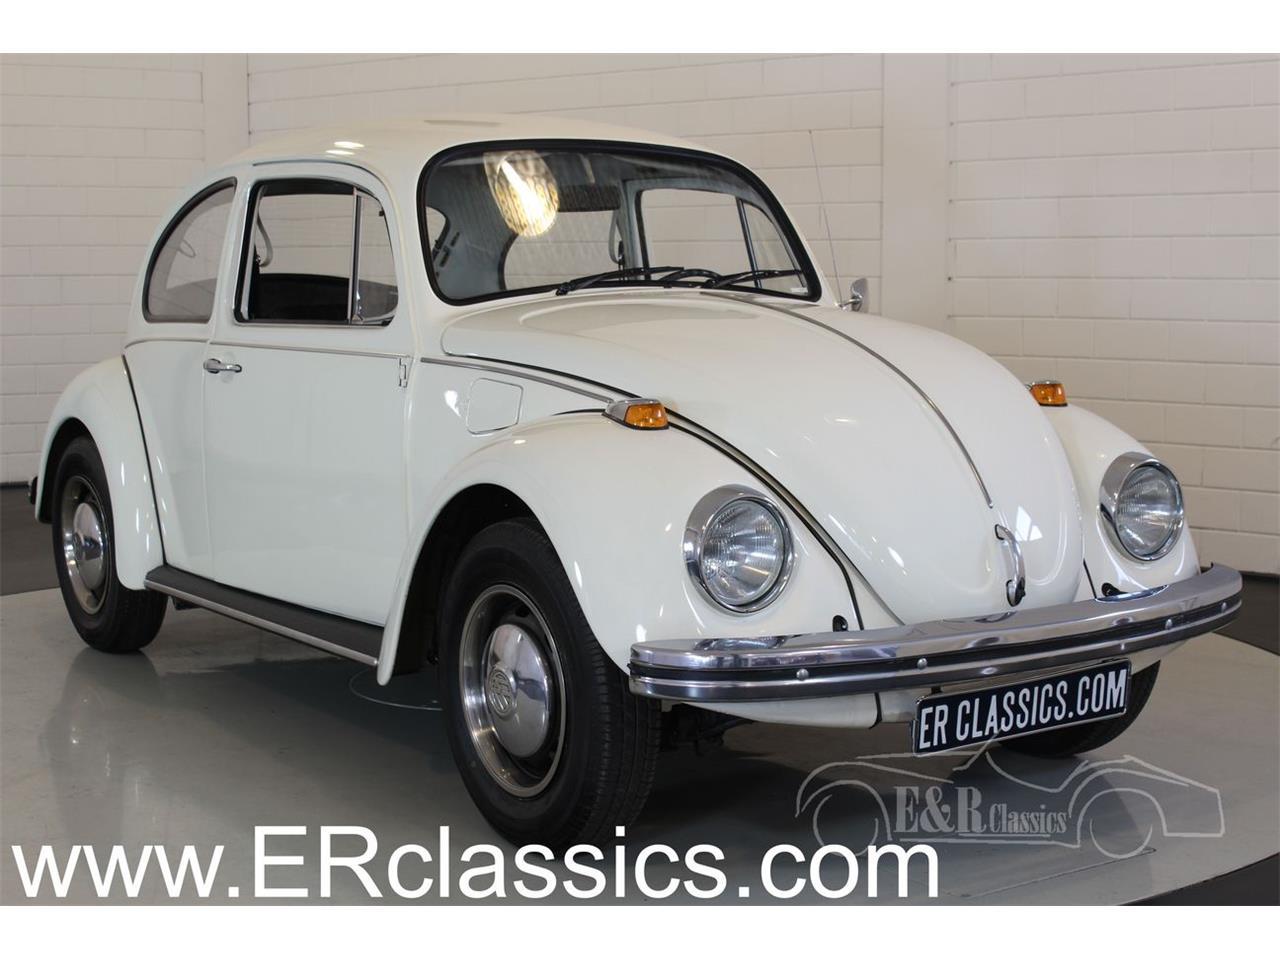 1973 Volkswagen Beetle For Sale Classiccars Com Cc 1237782